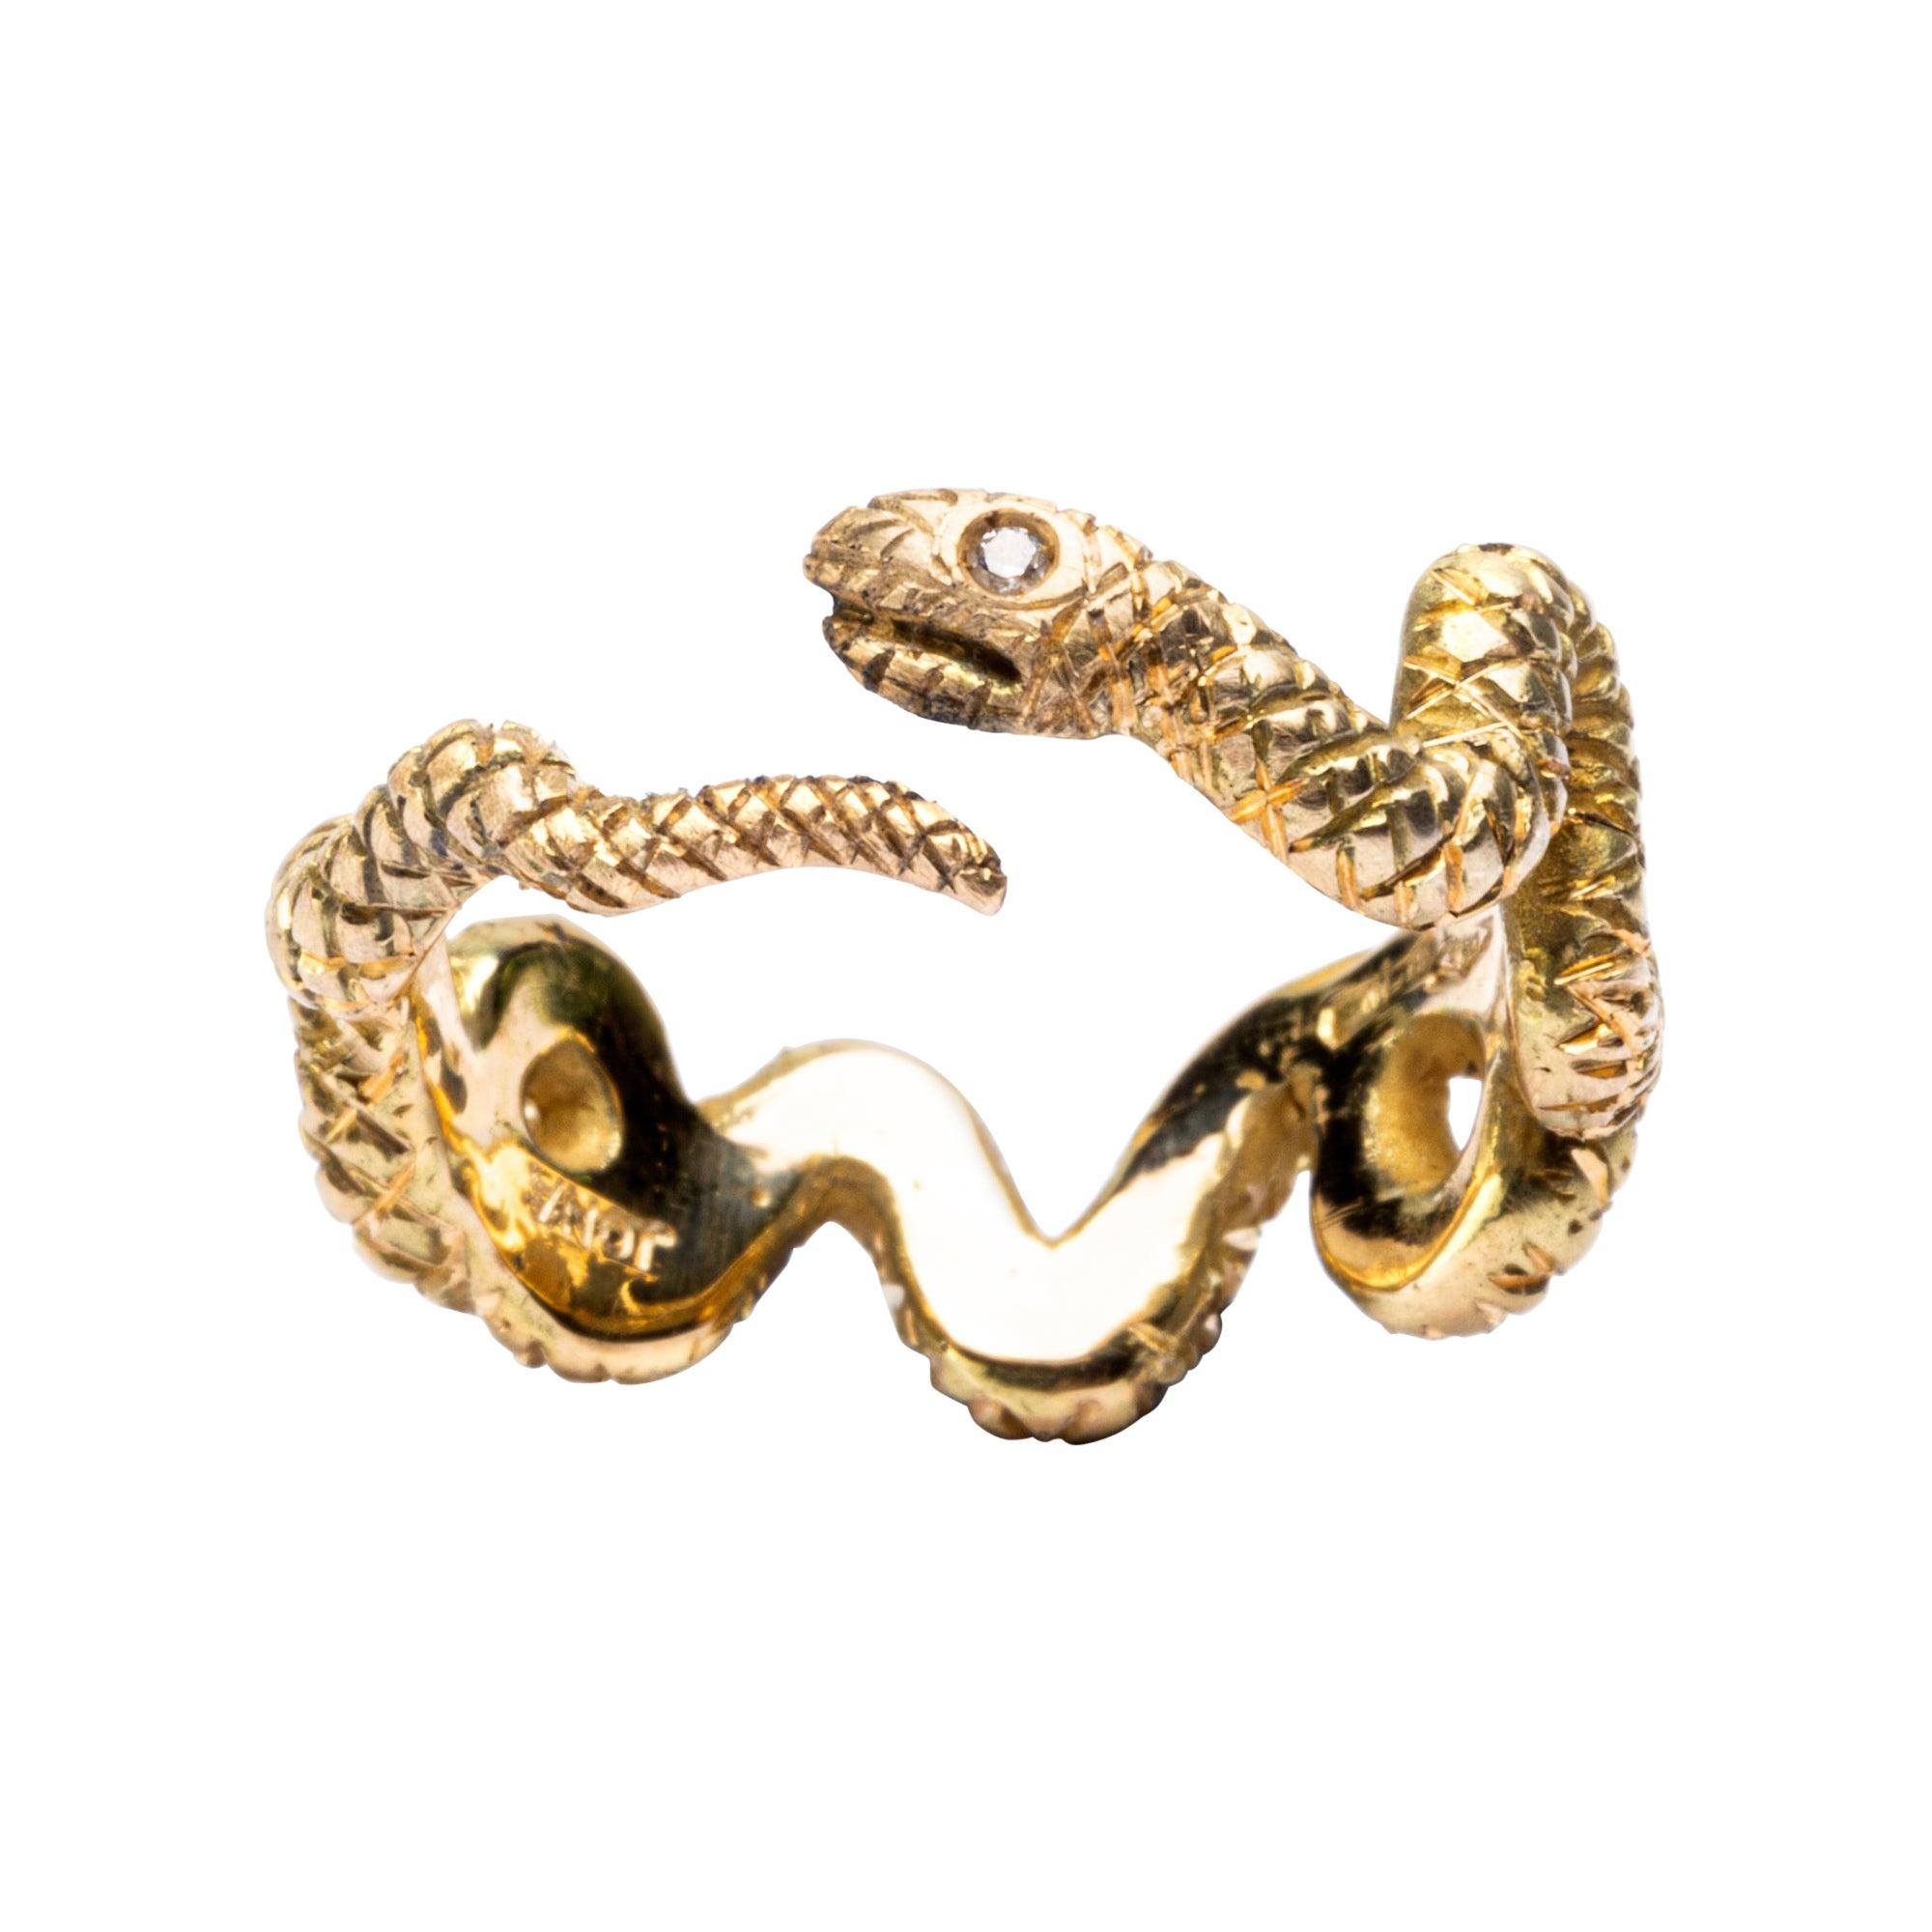 Alex Jona 18 Karat Yellow Gold Coil Snake Ring